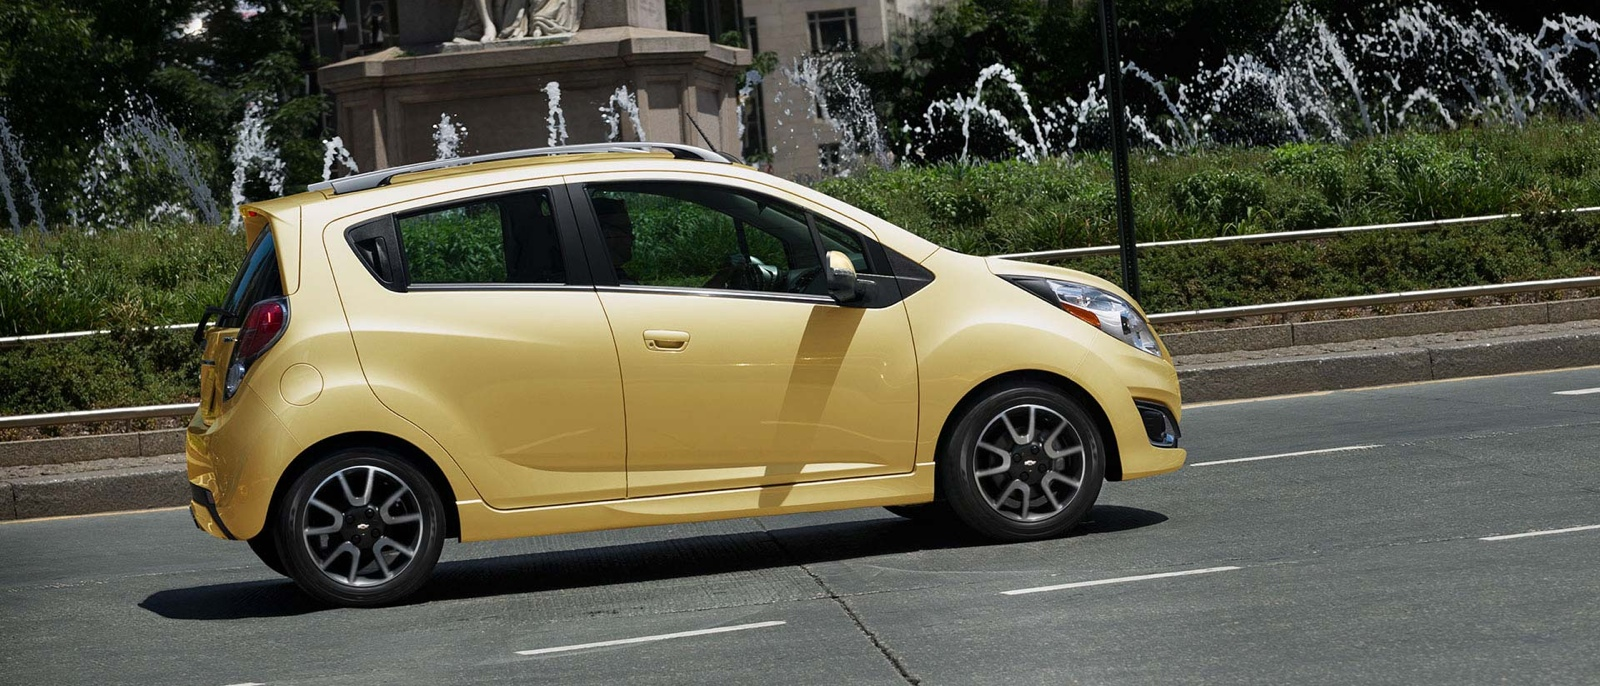 2015 Chevrolet Spark on city road